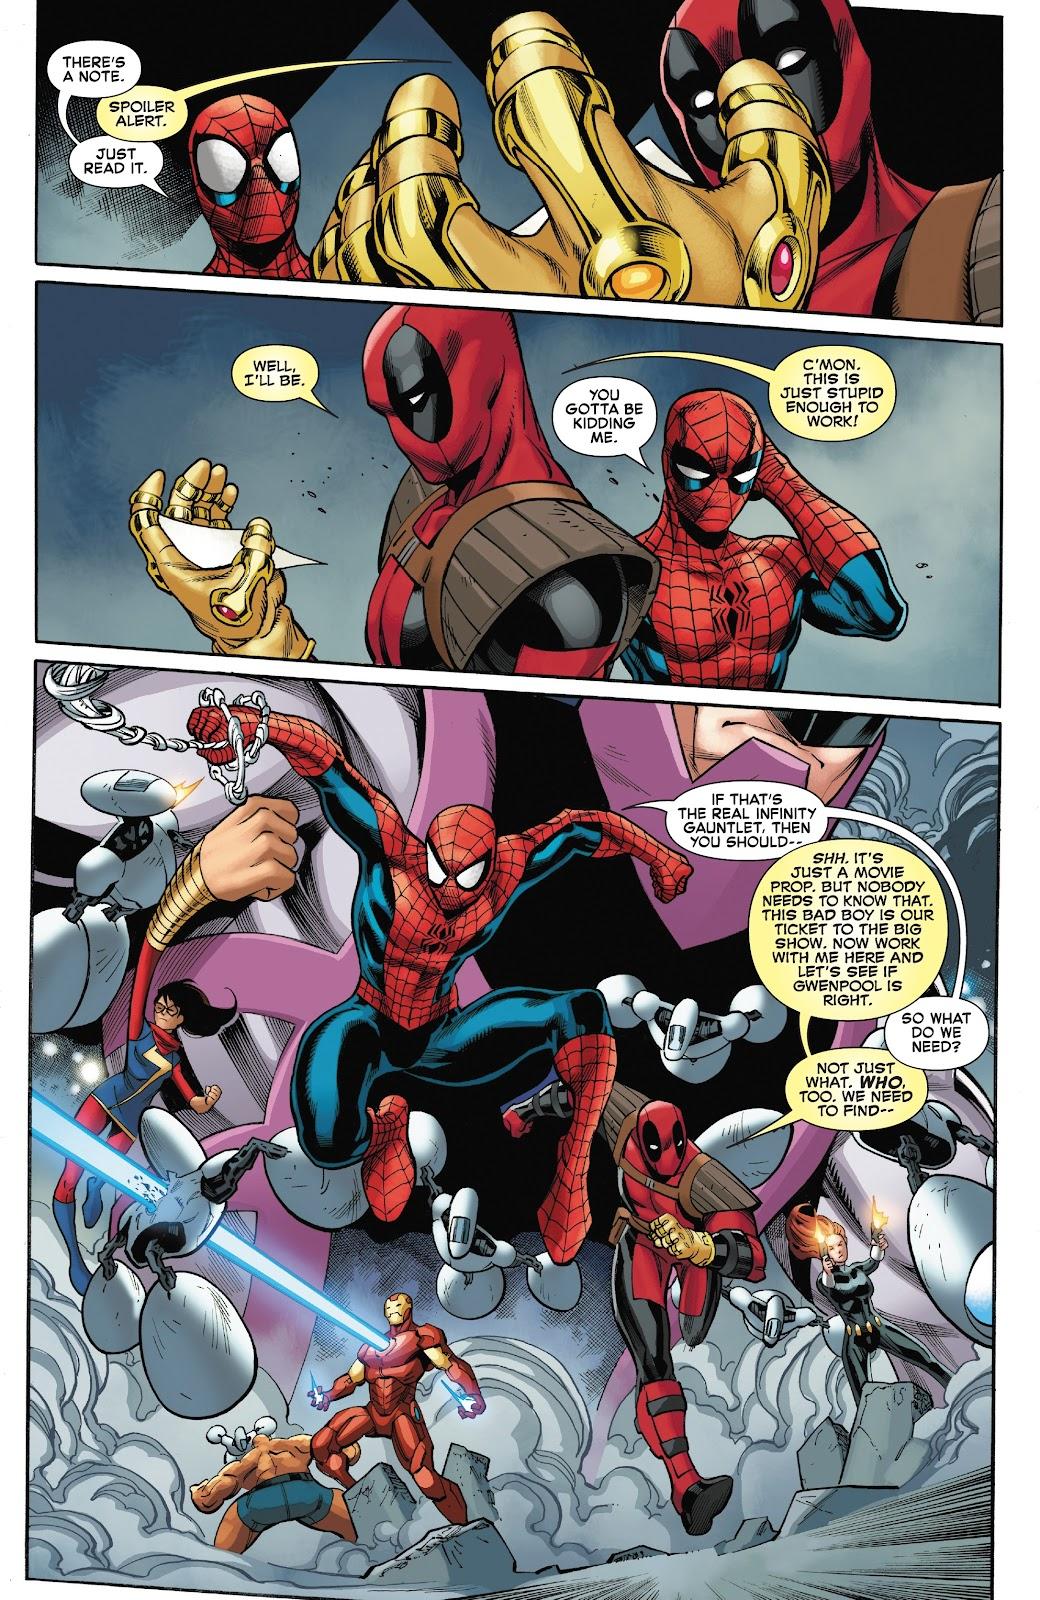 Read online Spider-Man/Deadpool comic -  Issue #49 - 12